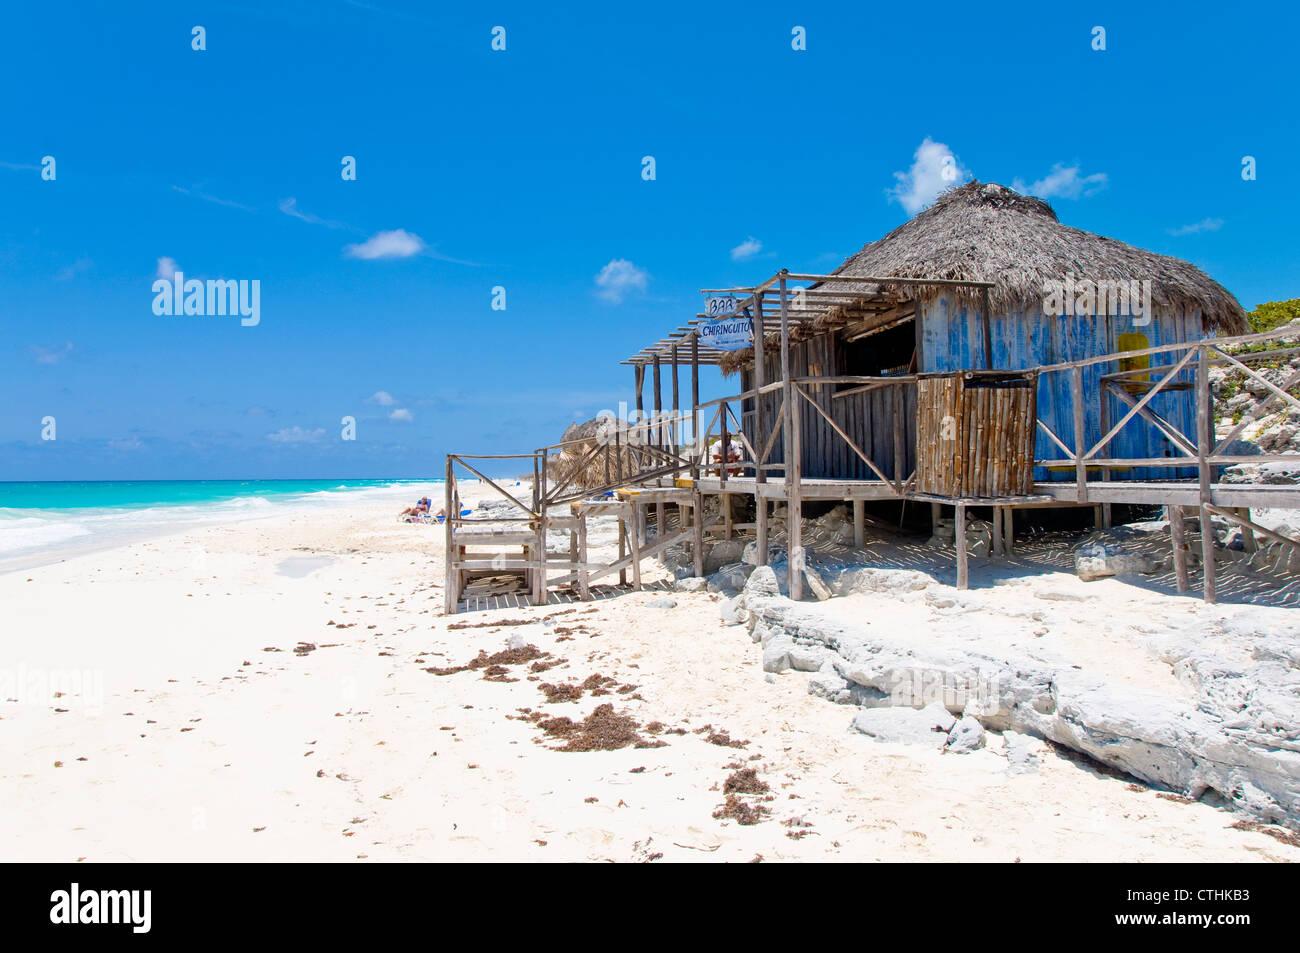 Bar de playa, Cayo Largo, Cuba Foto de stock